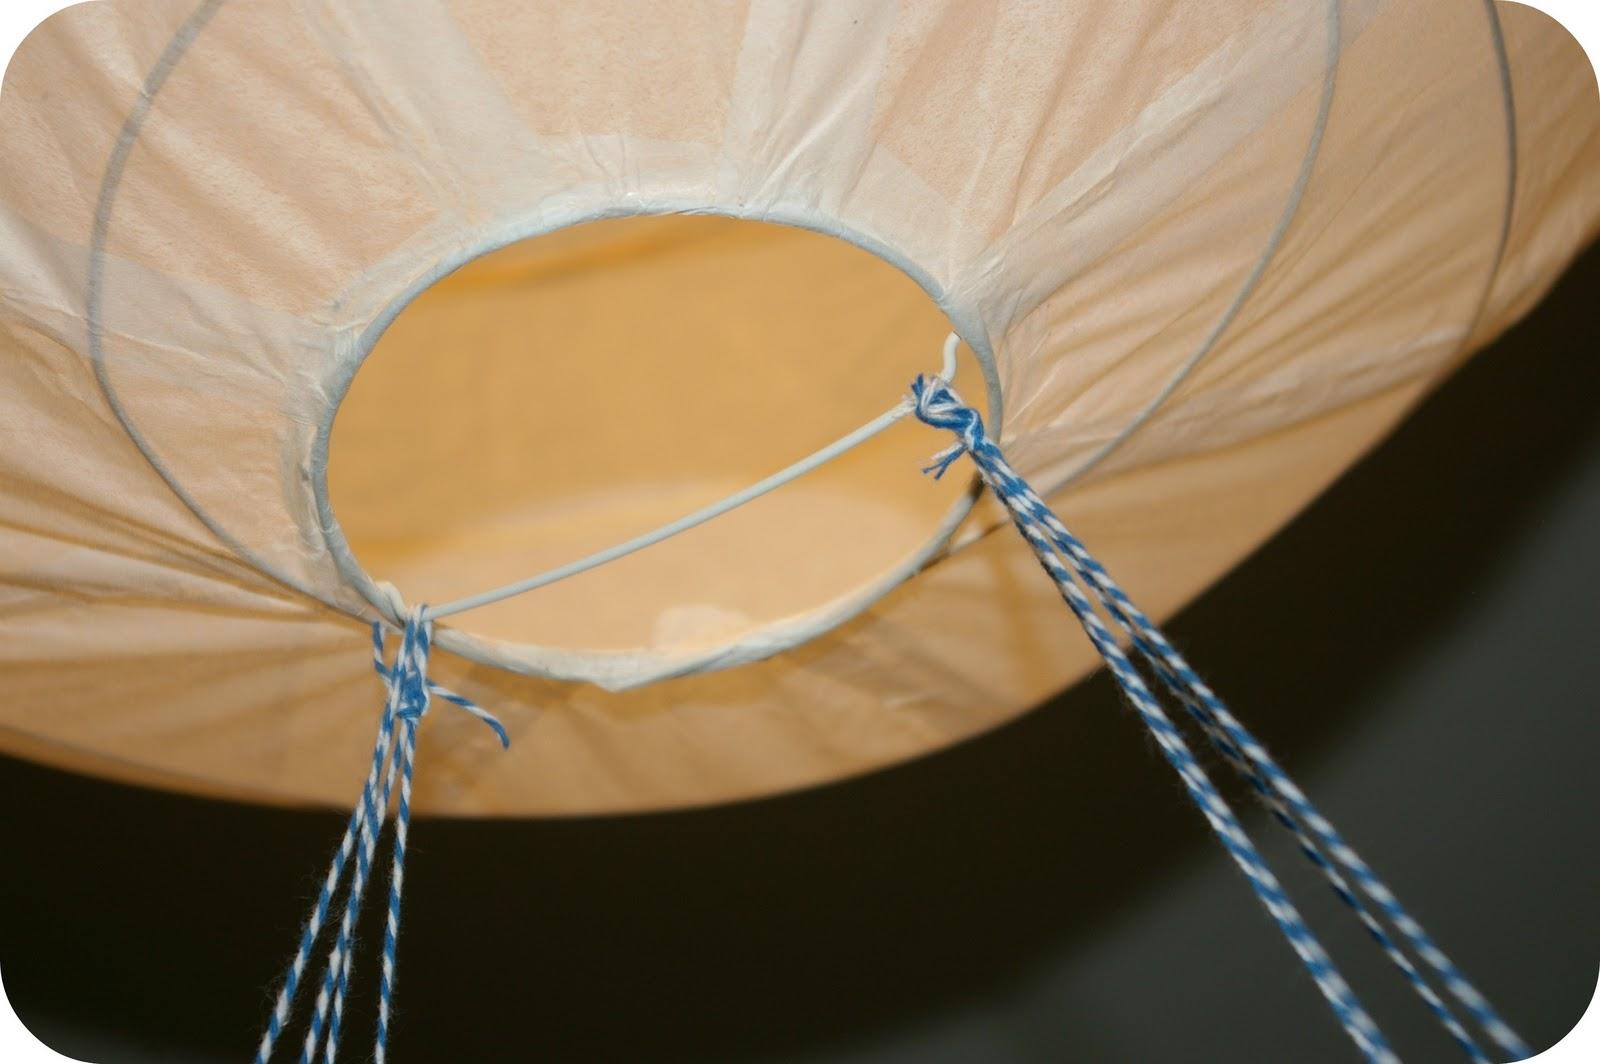 Jerrys Welt: DIY Heißluftballon-Lampe